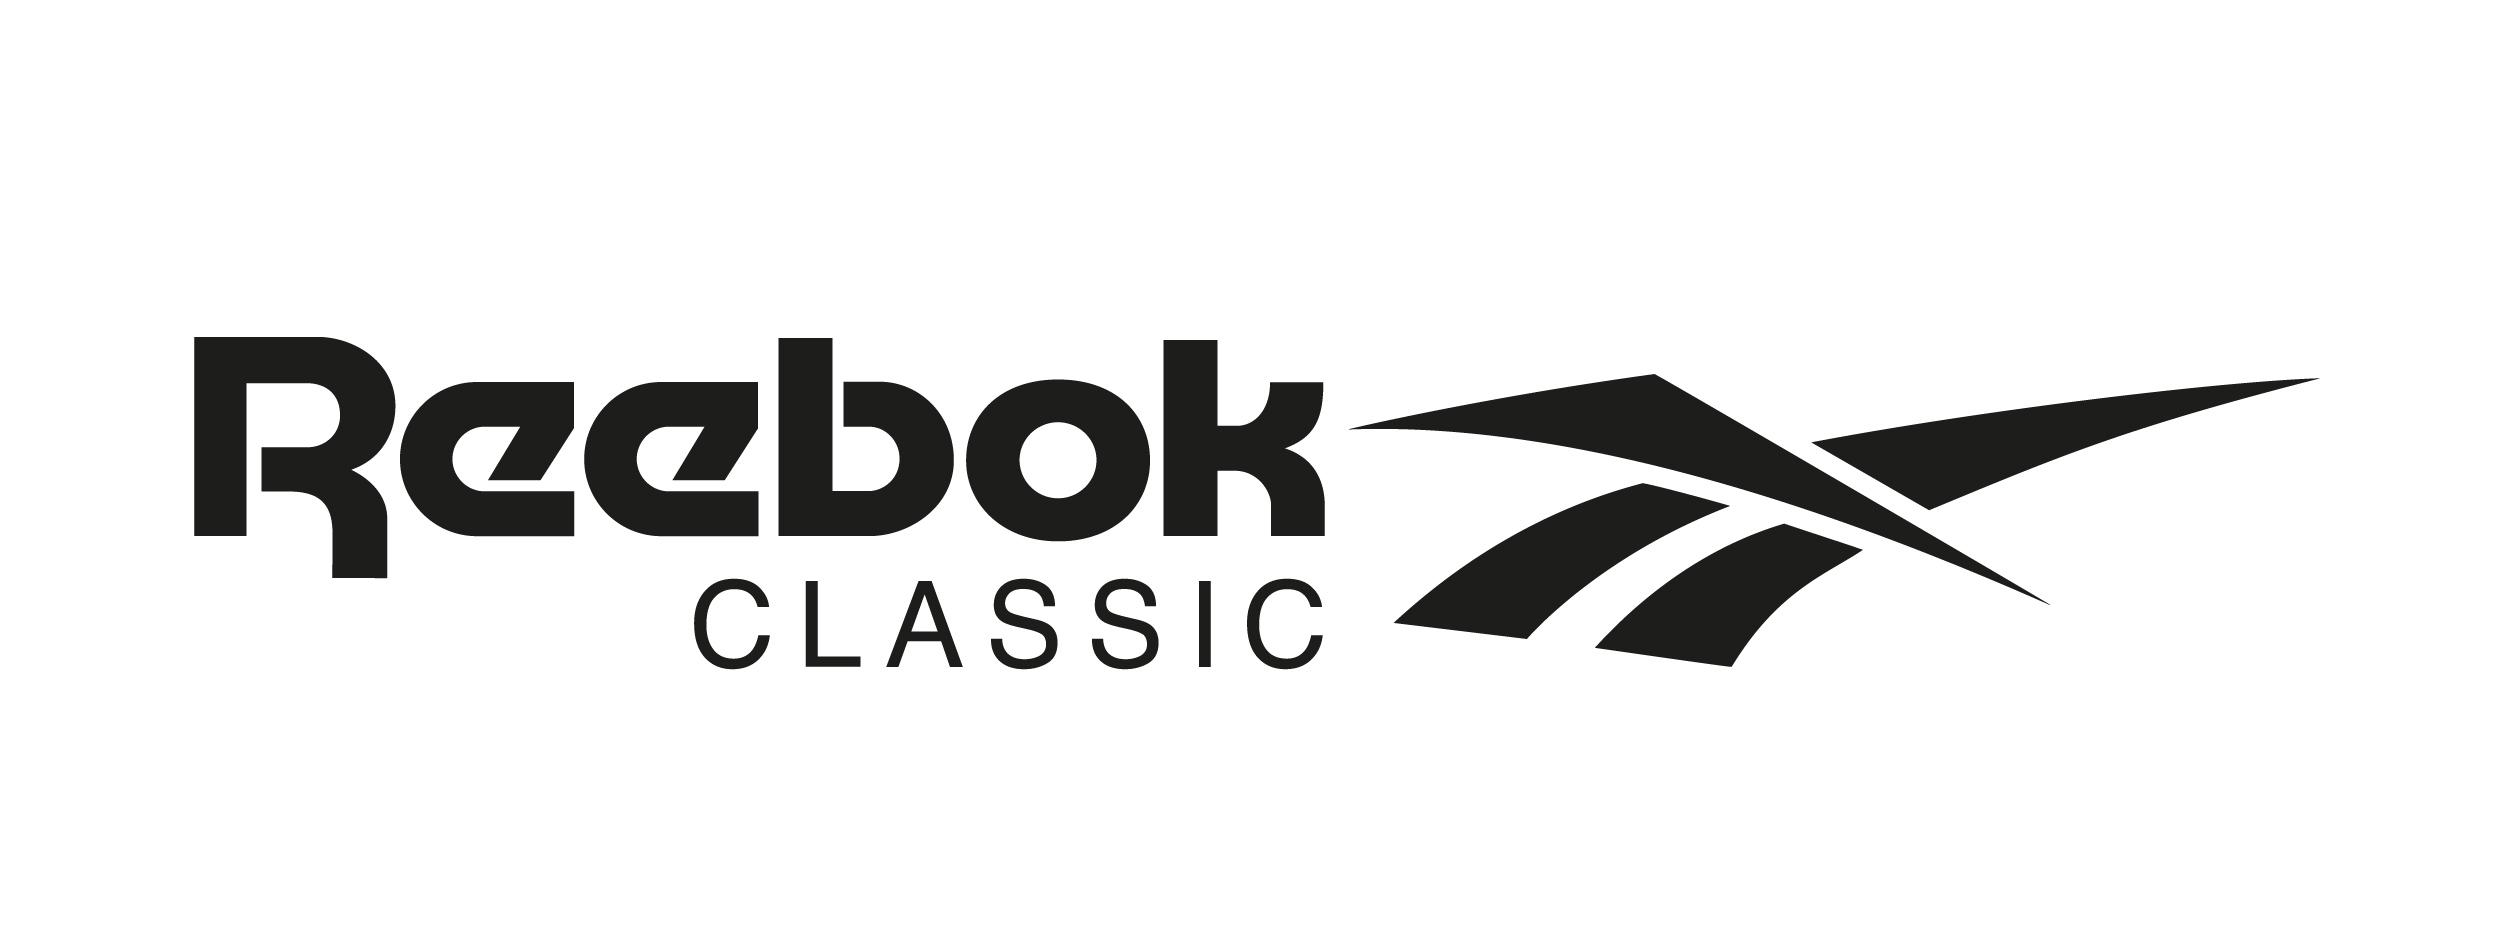 Reebok Classics